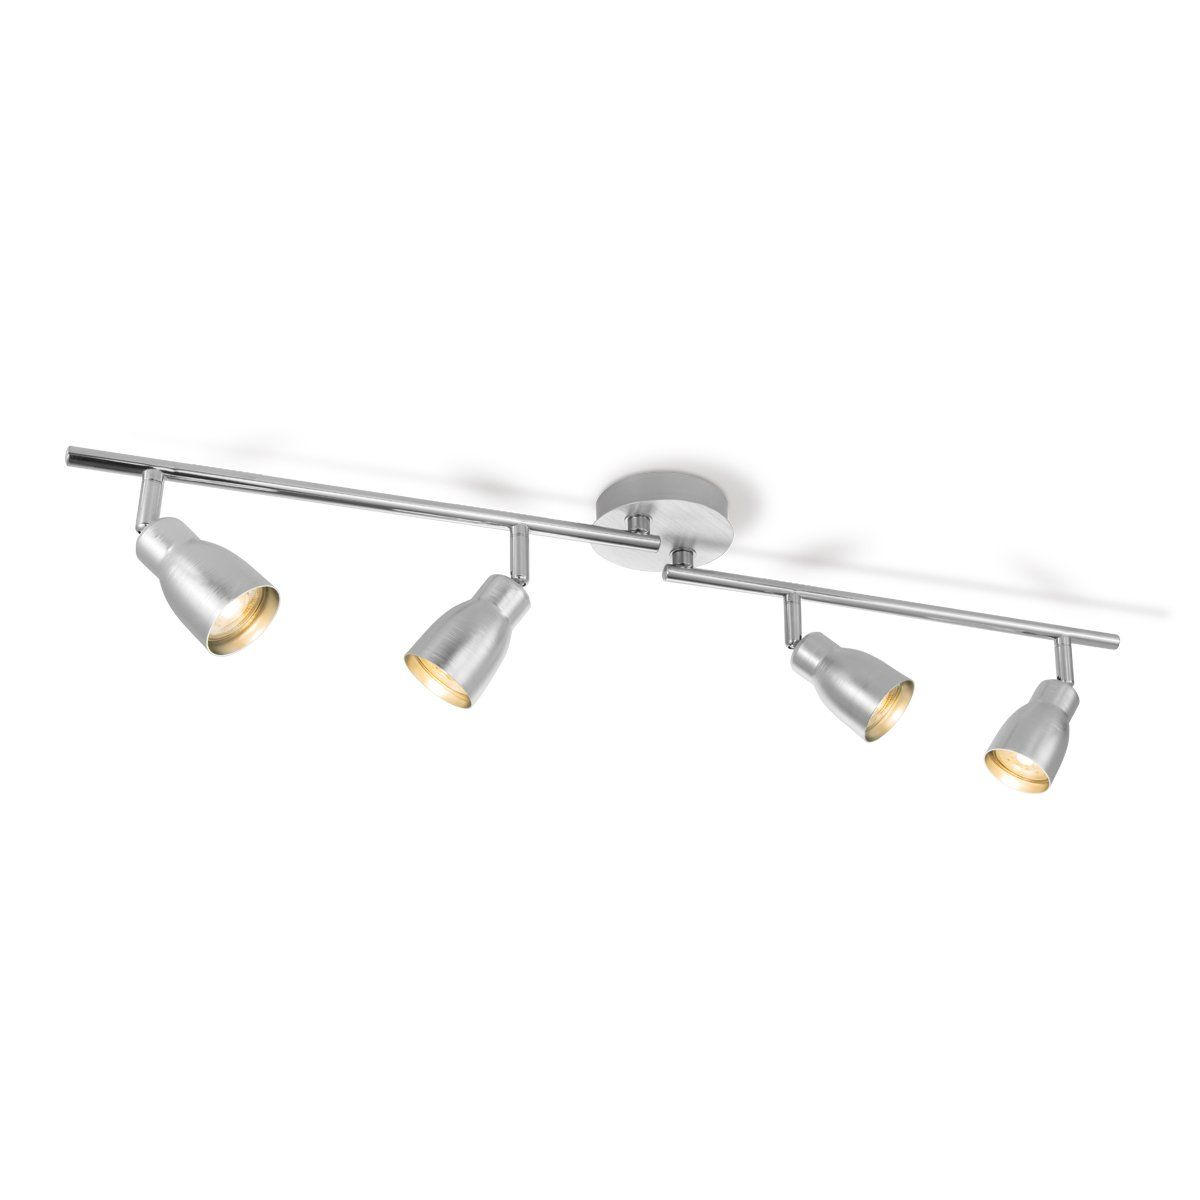 Home sweet home LED opbouwspot Alba 4 lichts ↔ 81 cm - aluminium